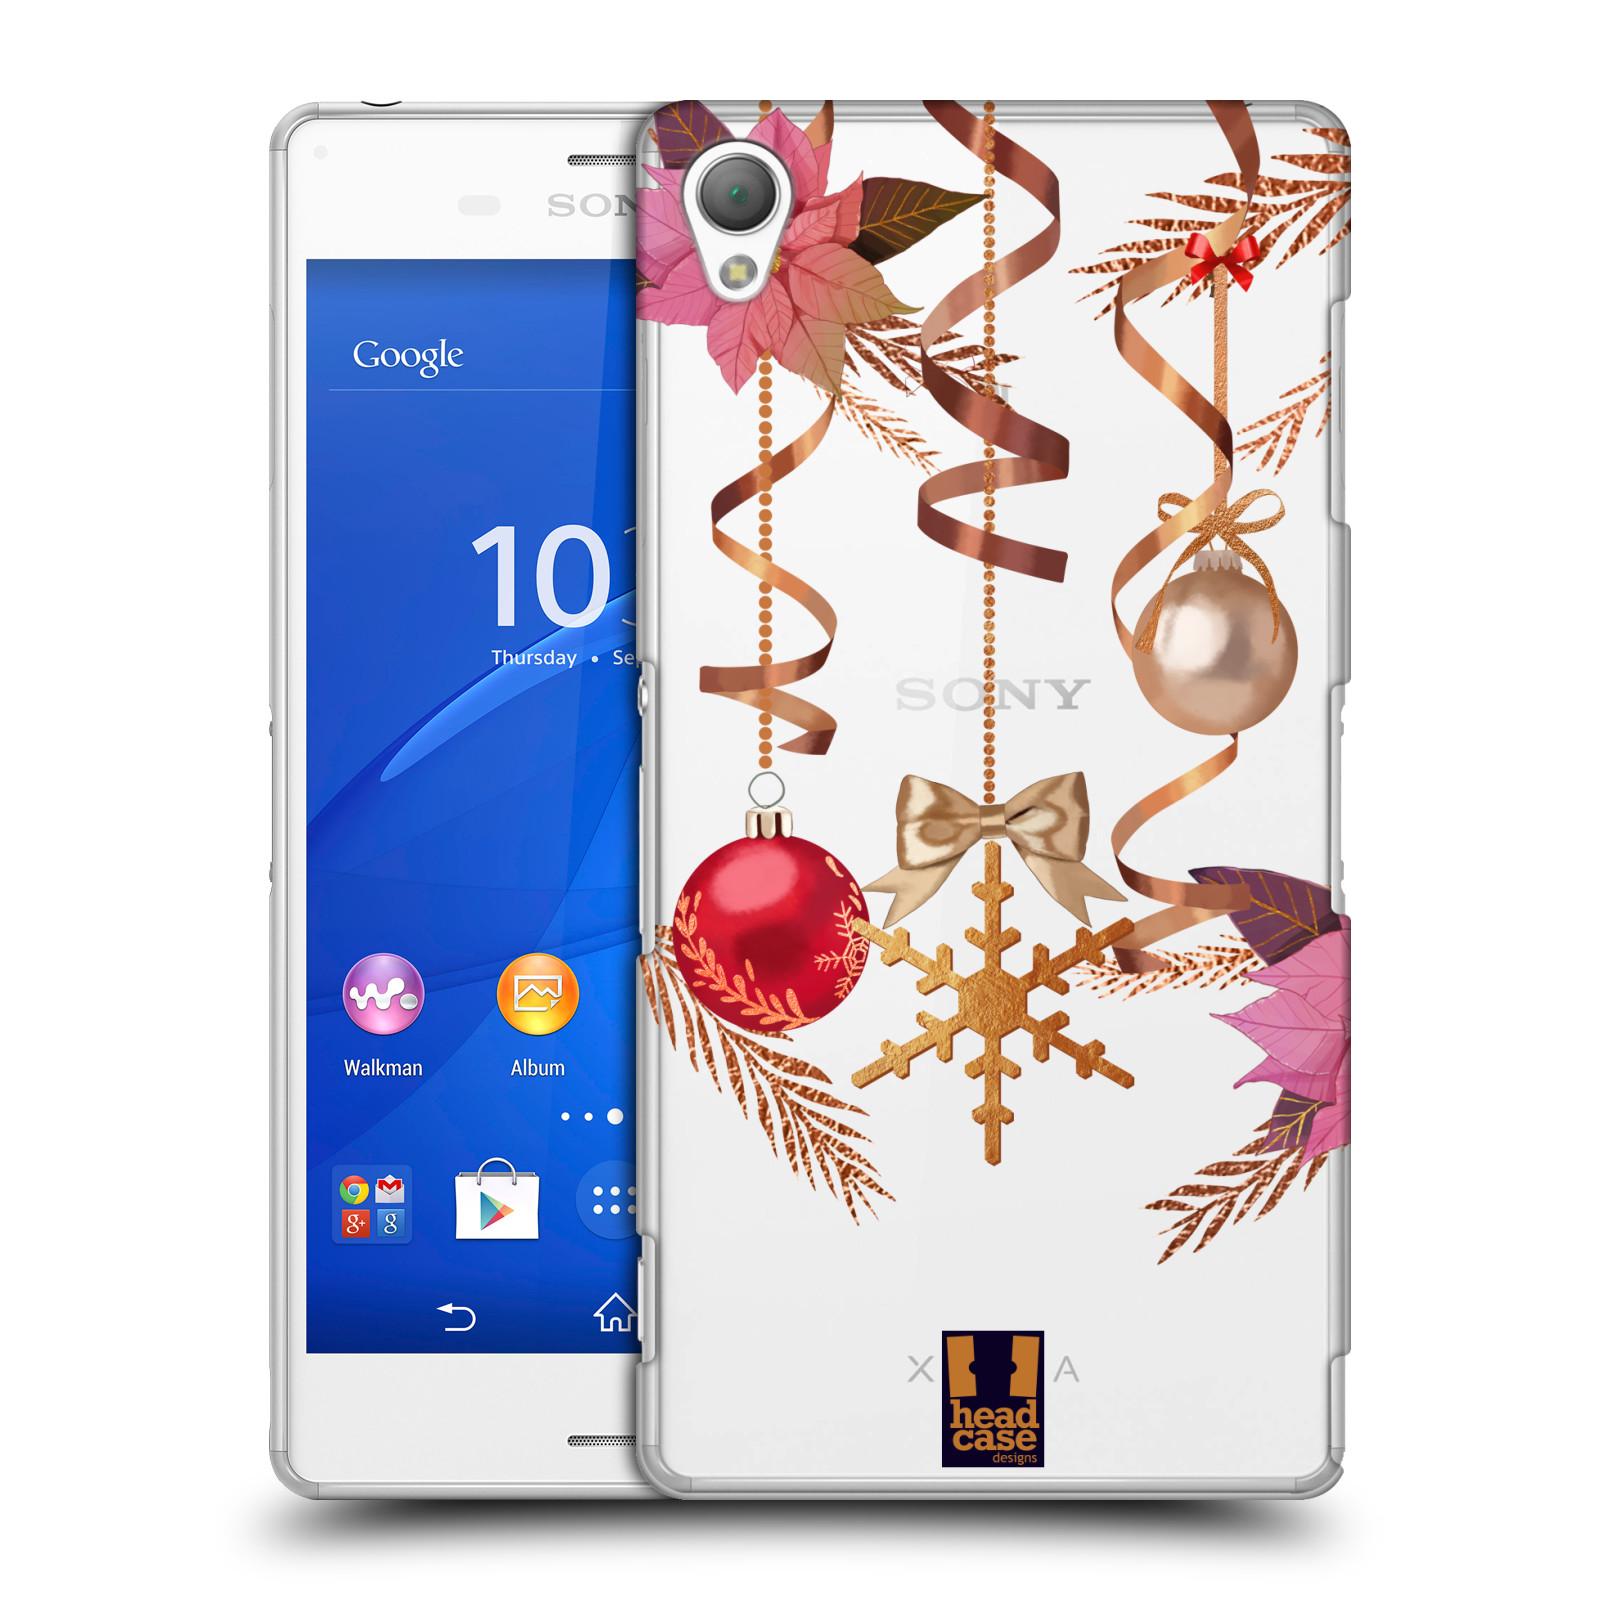 Plastové pouzdro na mobil Sony Xperia Z3 D6603 - Head Case - Vločka a vánoční ozdoby